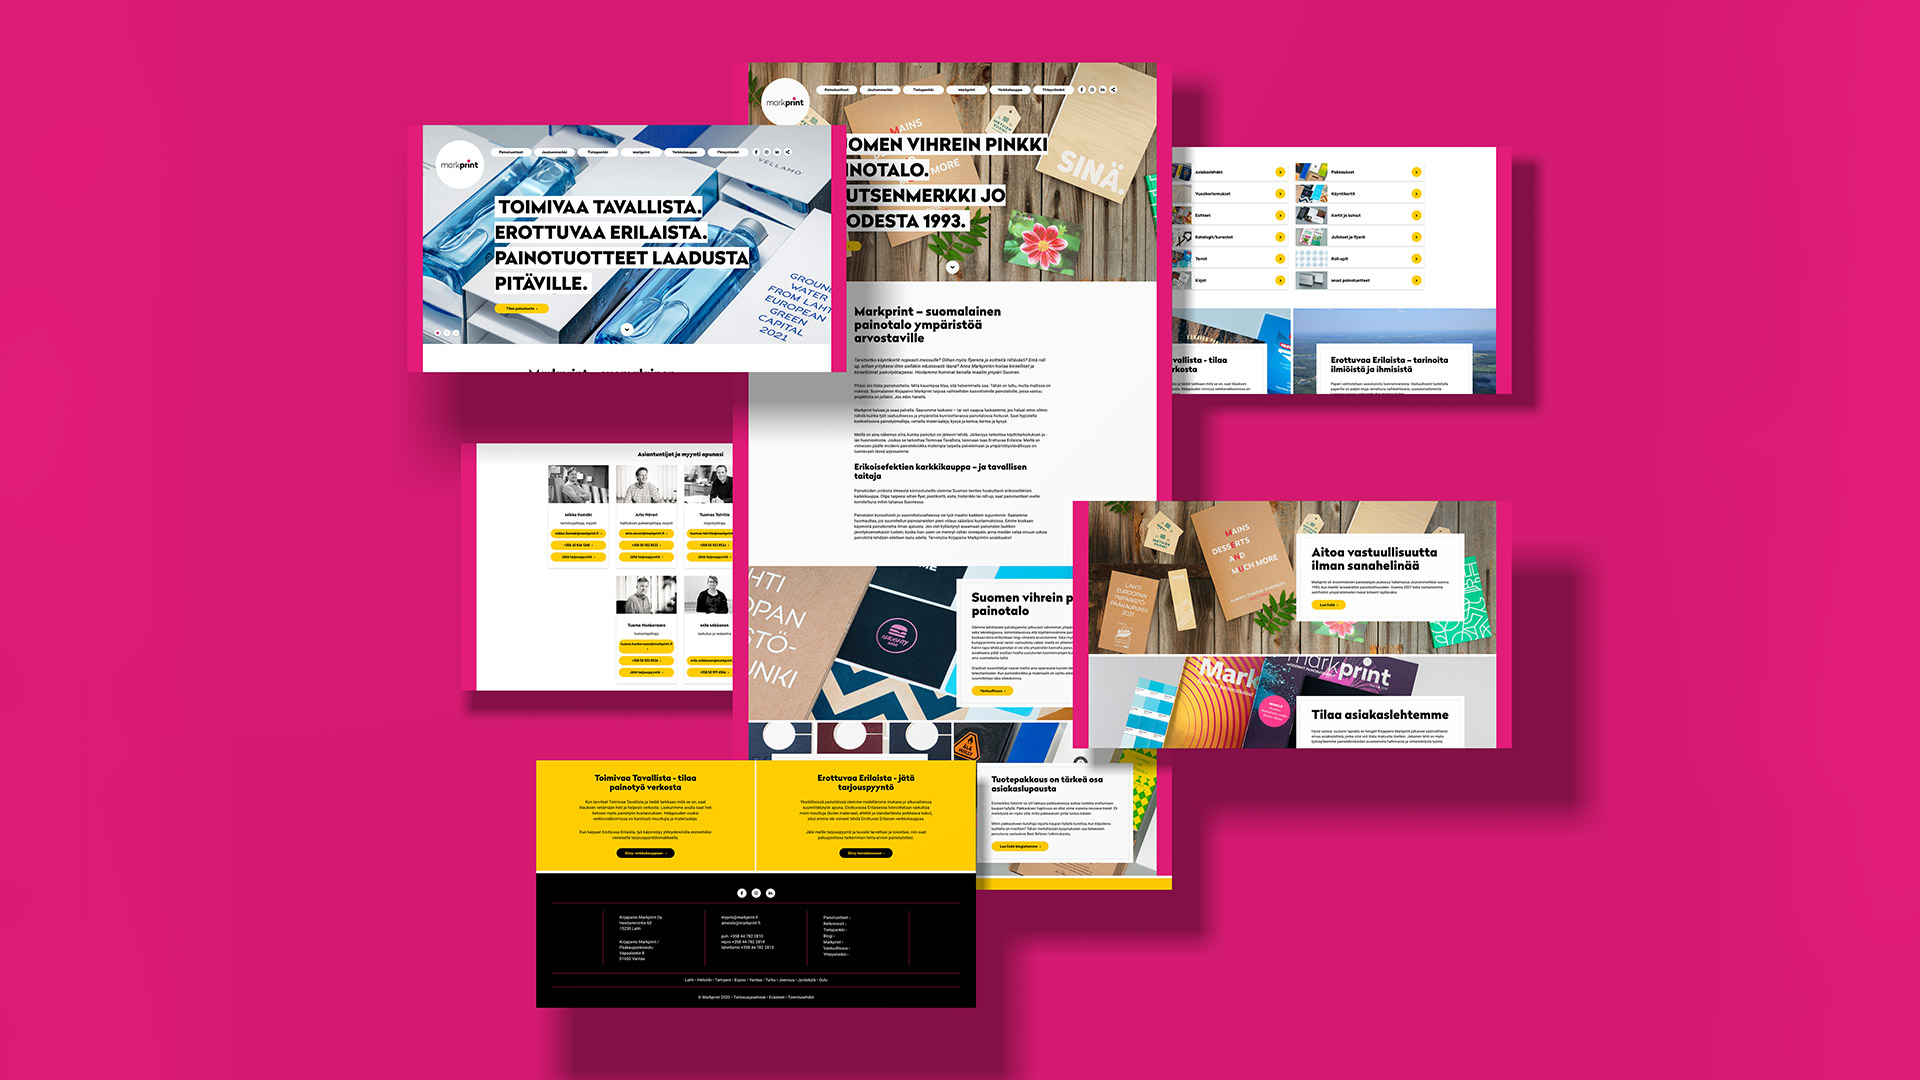 markprint-verkkosivu-mockup2.jpg